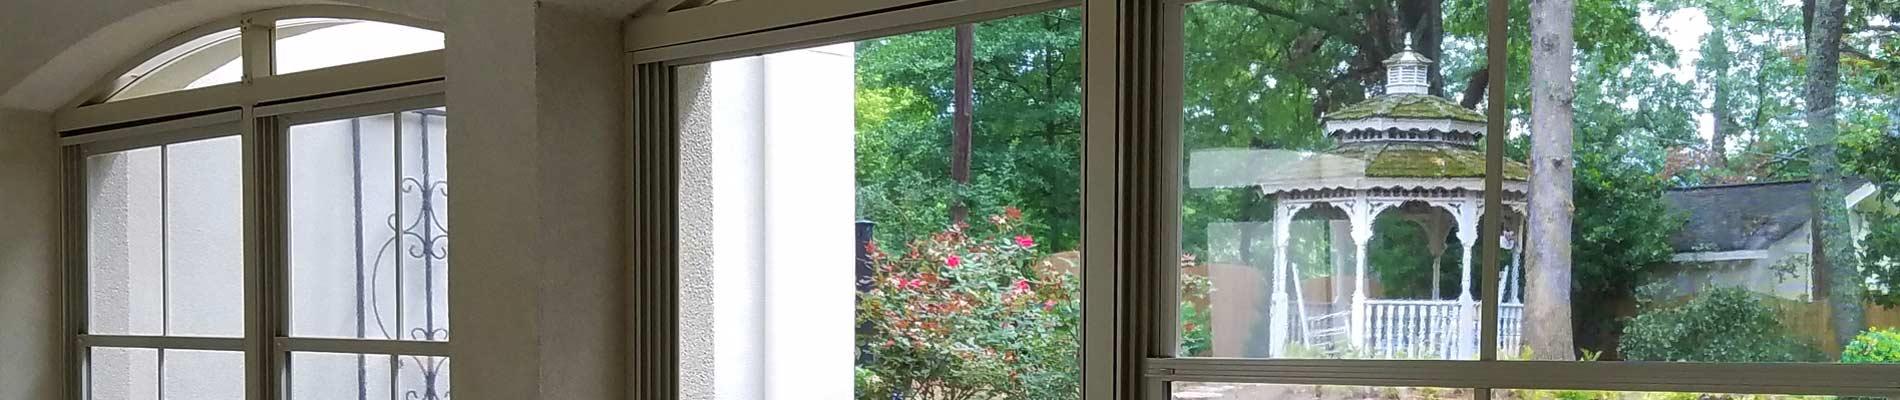 Door & Window Screen Installation-Porch Enclosures   Nelson